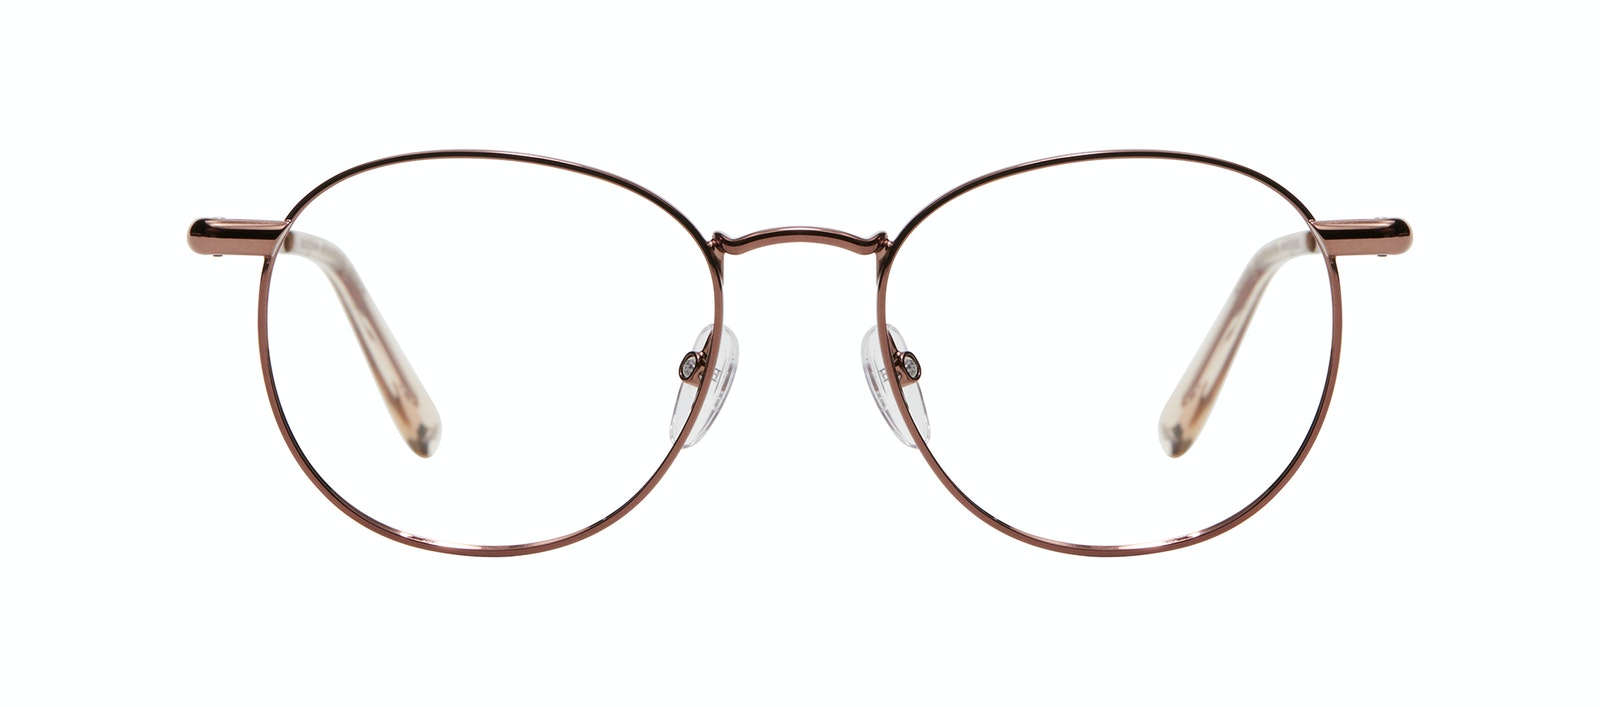 Affordable Fashion Glasses Round Sunglasses Women Divine M Copper Front